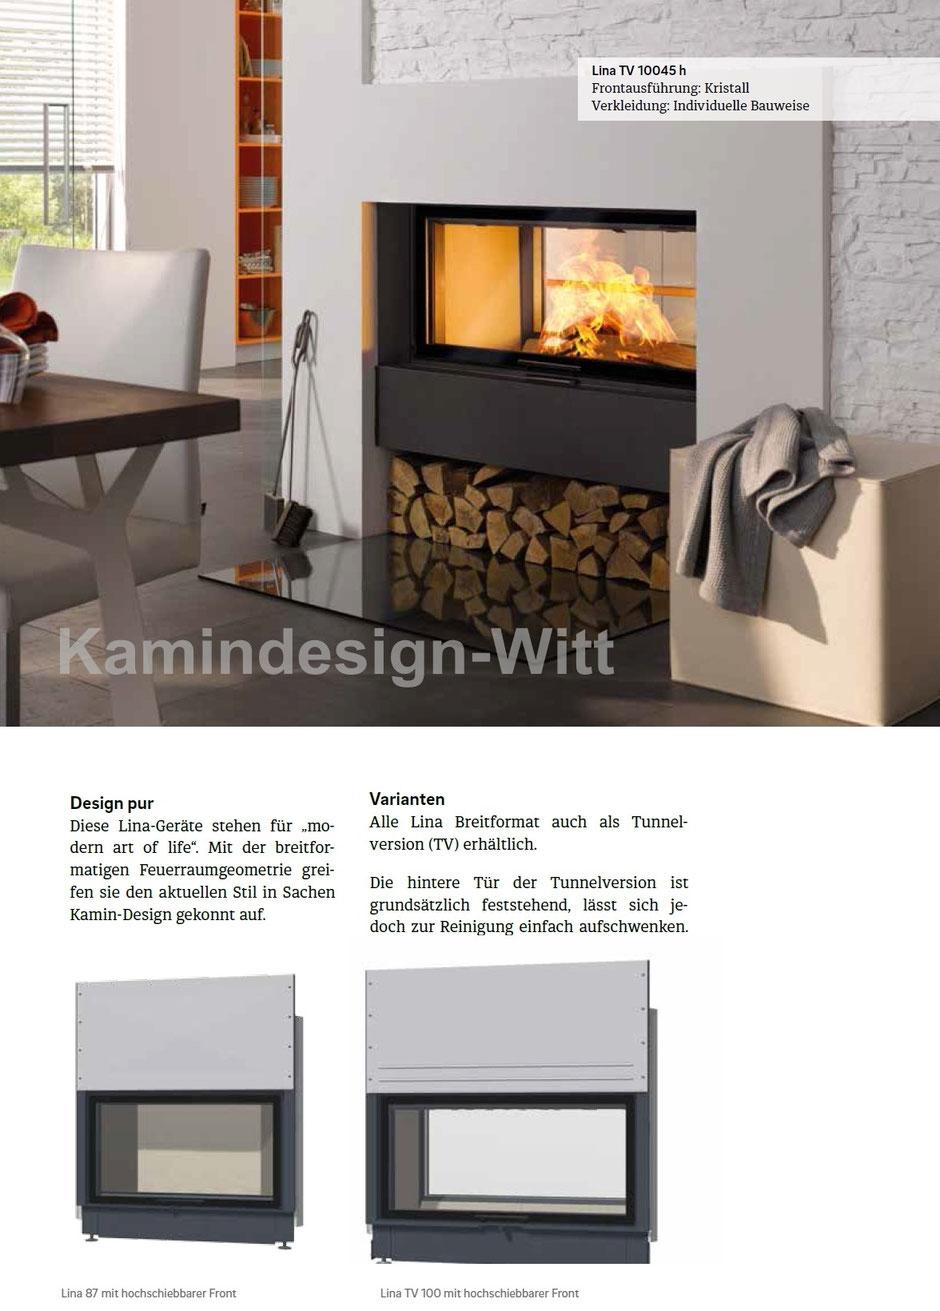 Schmid-Lina-73s-Kamineinsatz